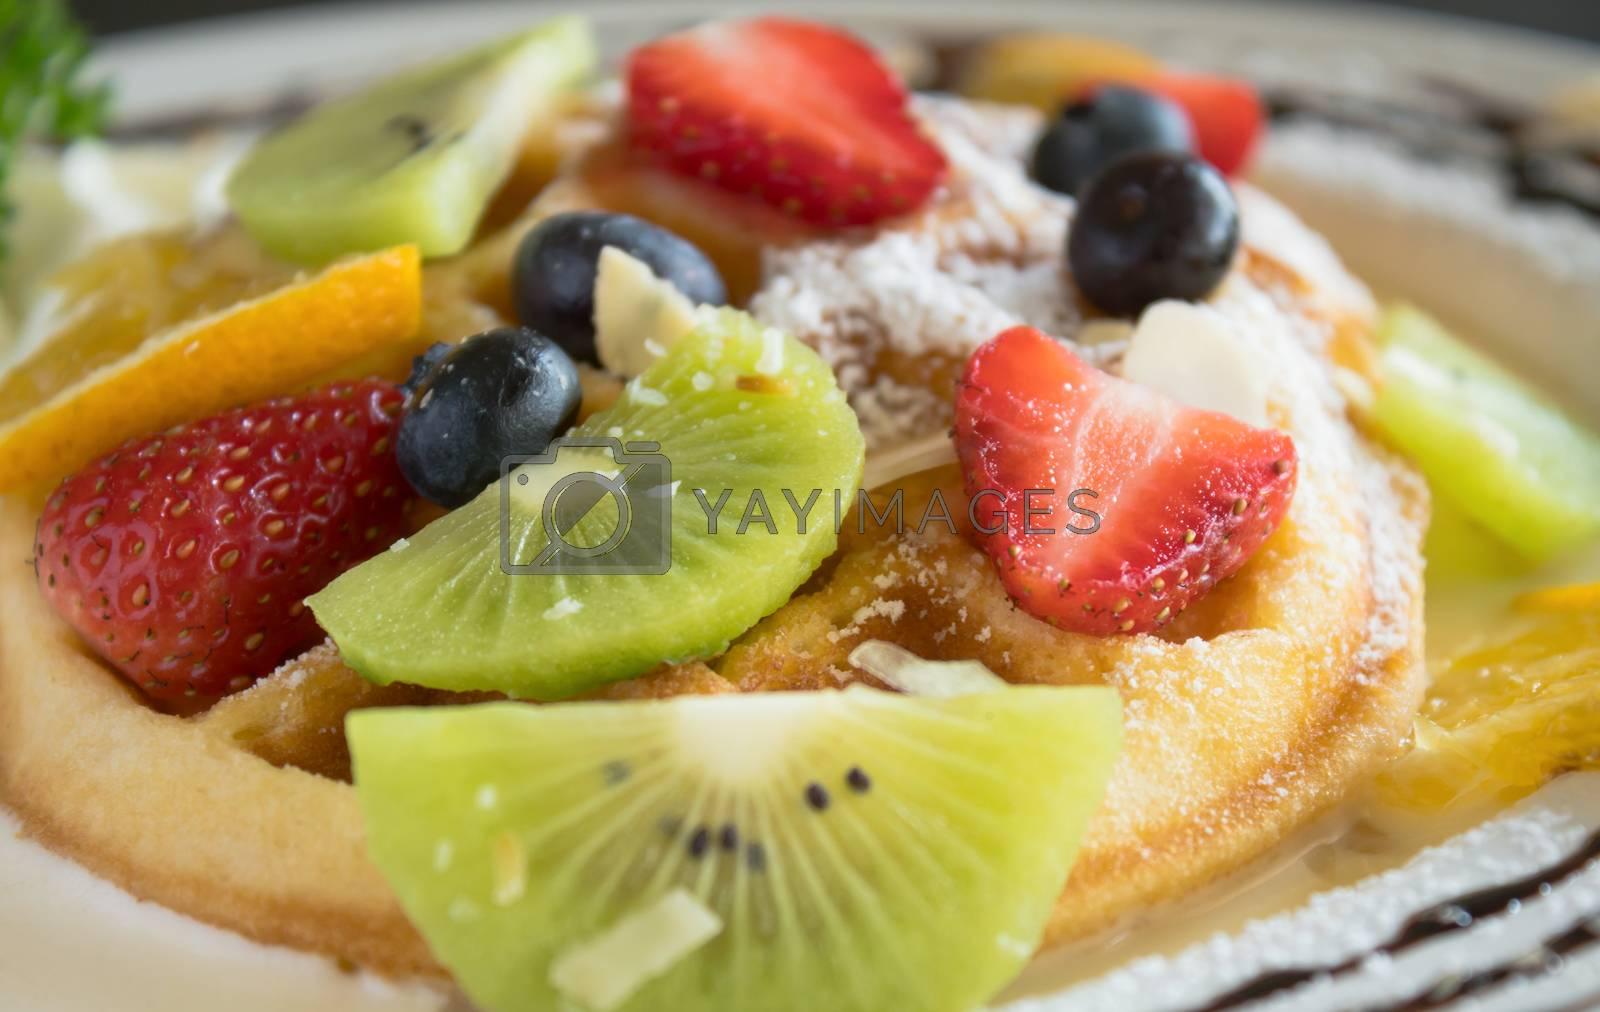 Kiwi Strawberry Blueberry Lemon Waffle Chocolate Dessert. Fruity dessert food and drink category